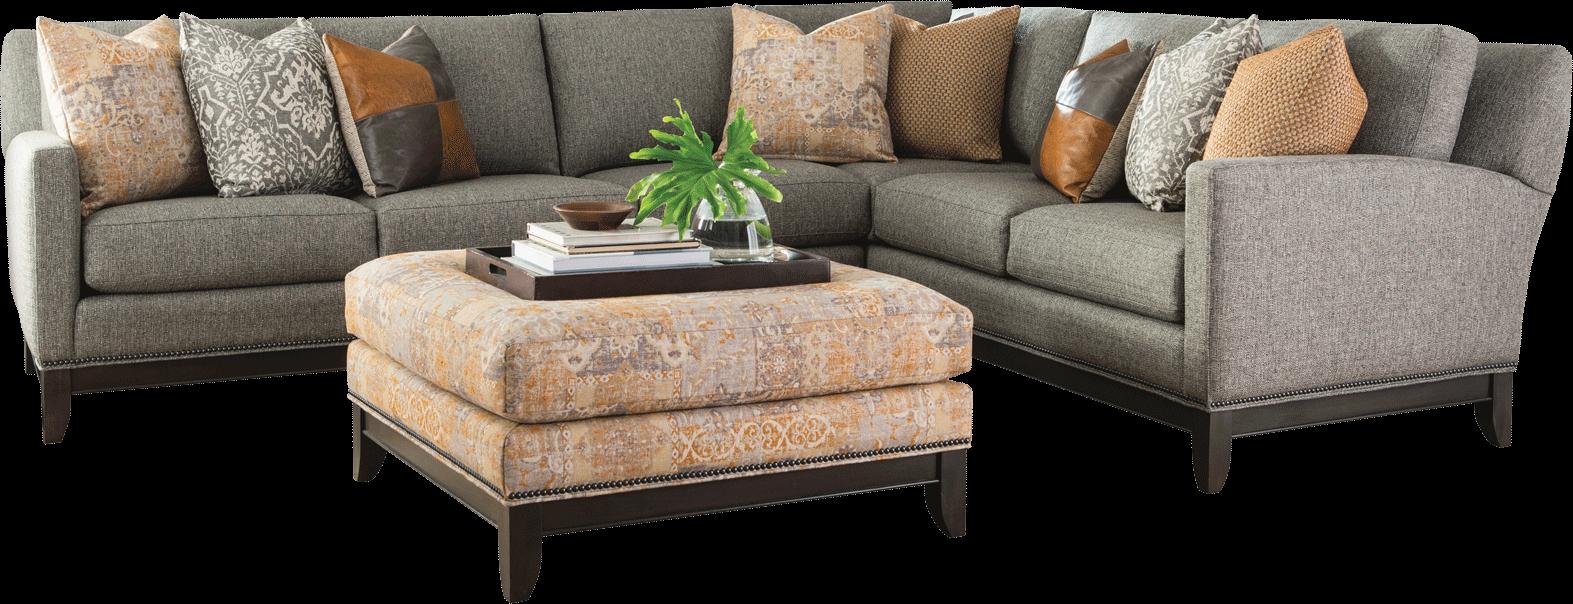 Smith Brothers Sofa